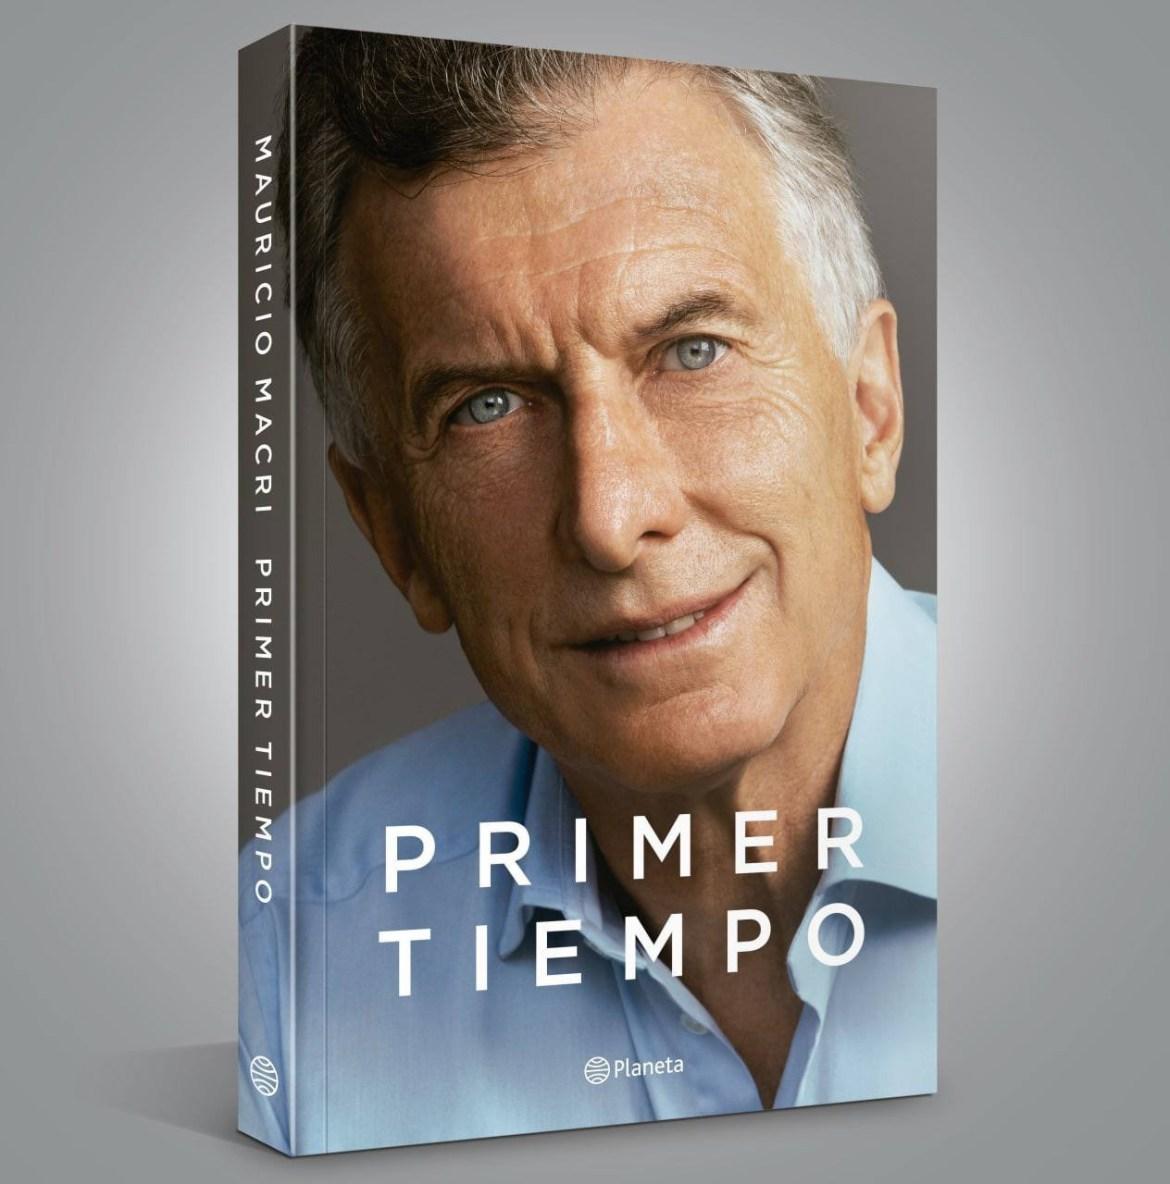 "Polémica definición de Mauricio Macri sobre Cristina Kirchner en su libro: ""No está bien"""